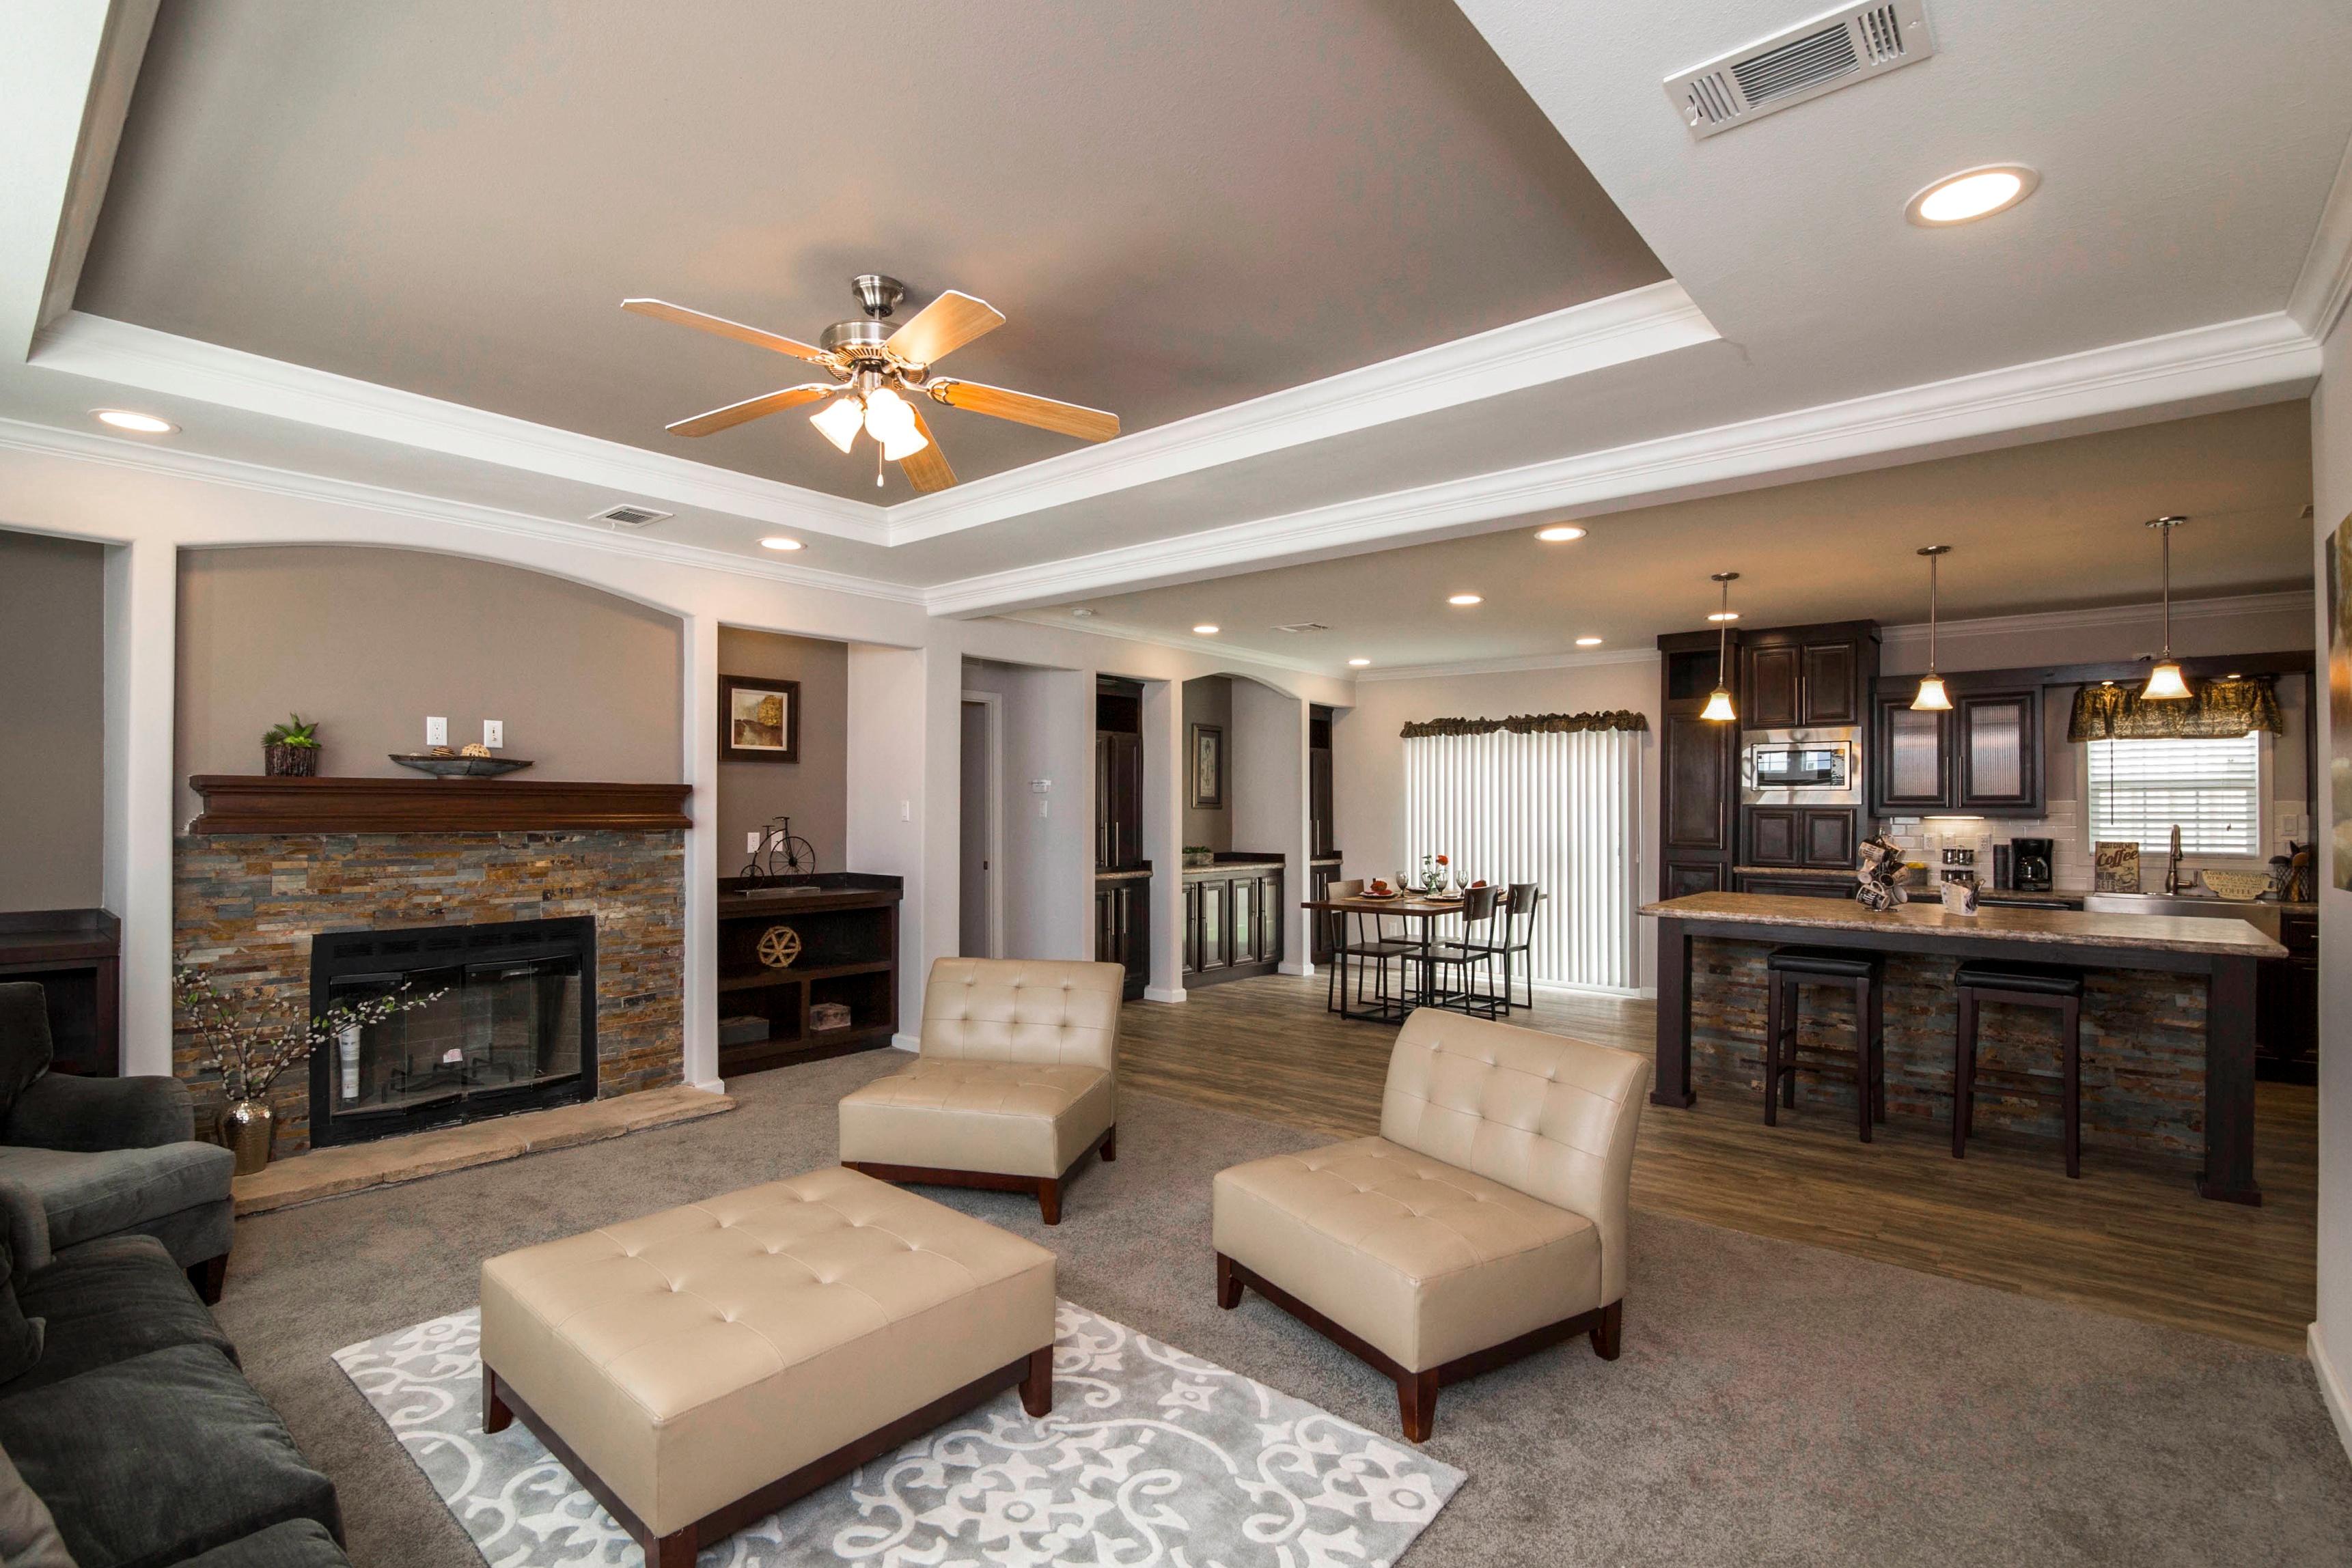 Hillcrest living room 1 copy.jpg